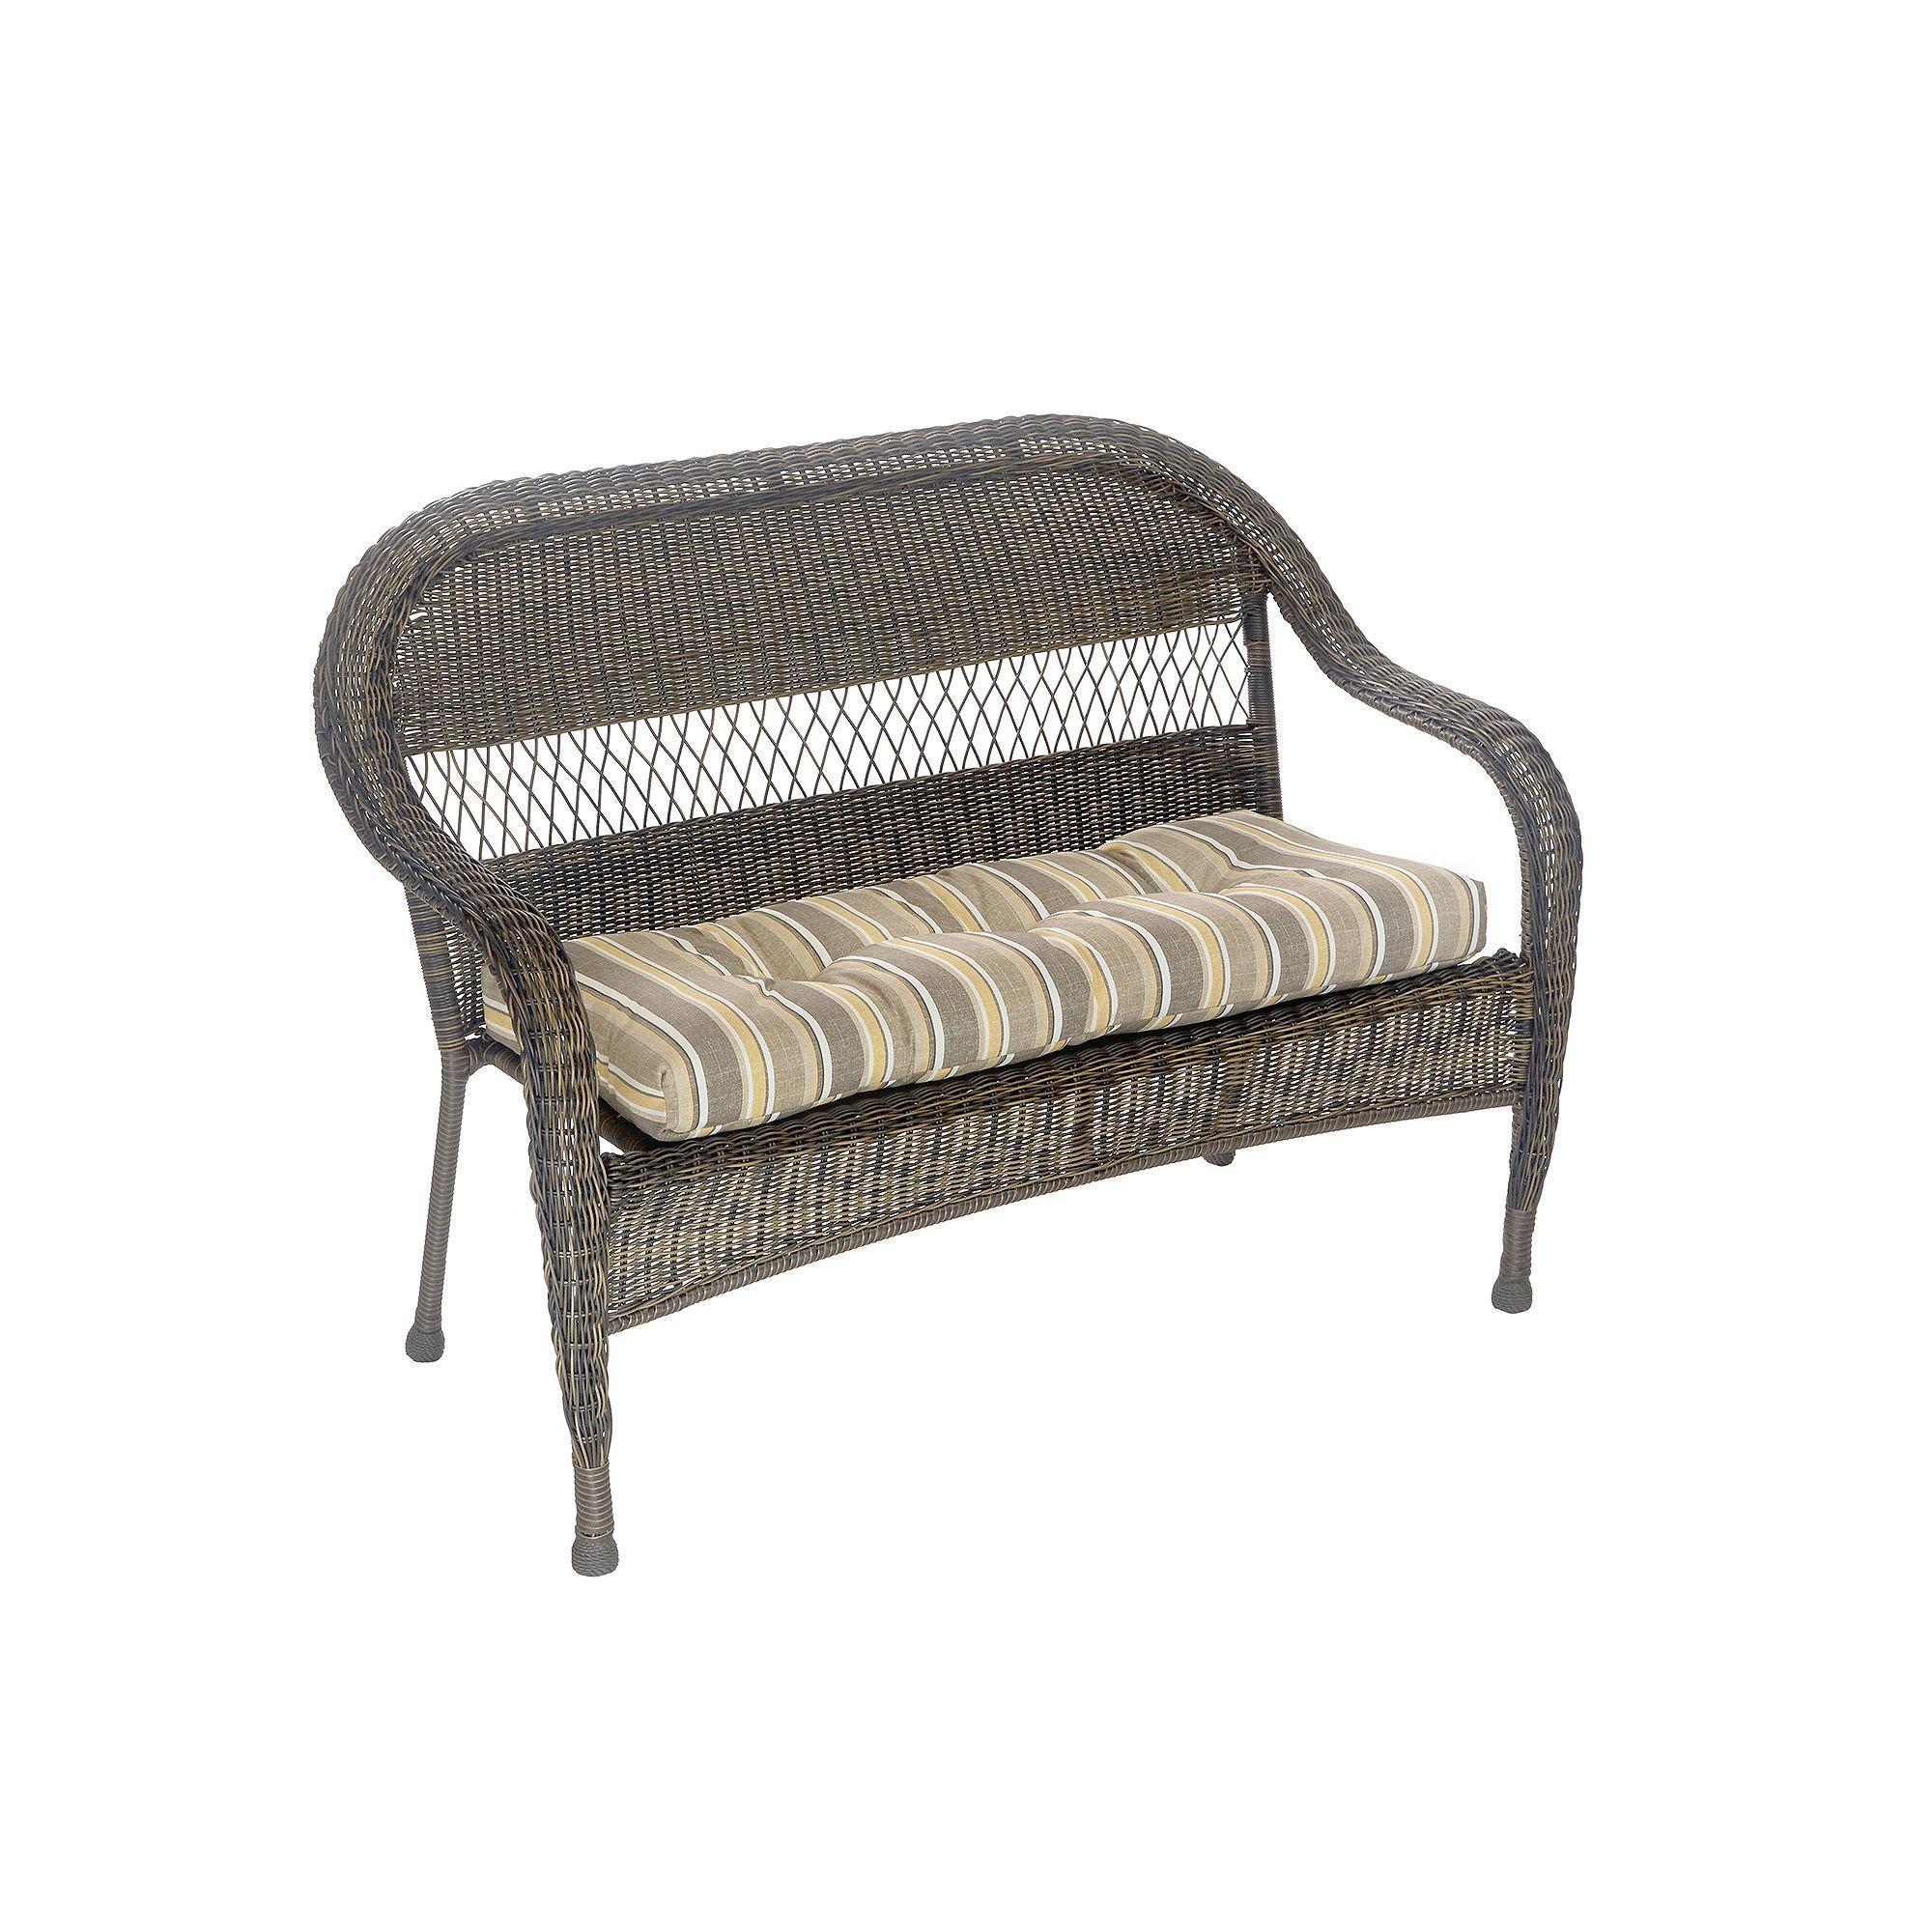 Klear Vu Indoor Outdoor Patio Bench Cushion Beig Green Beig